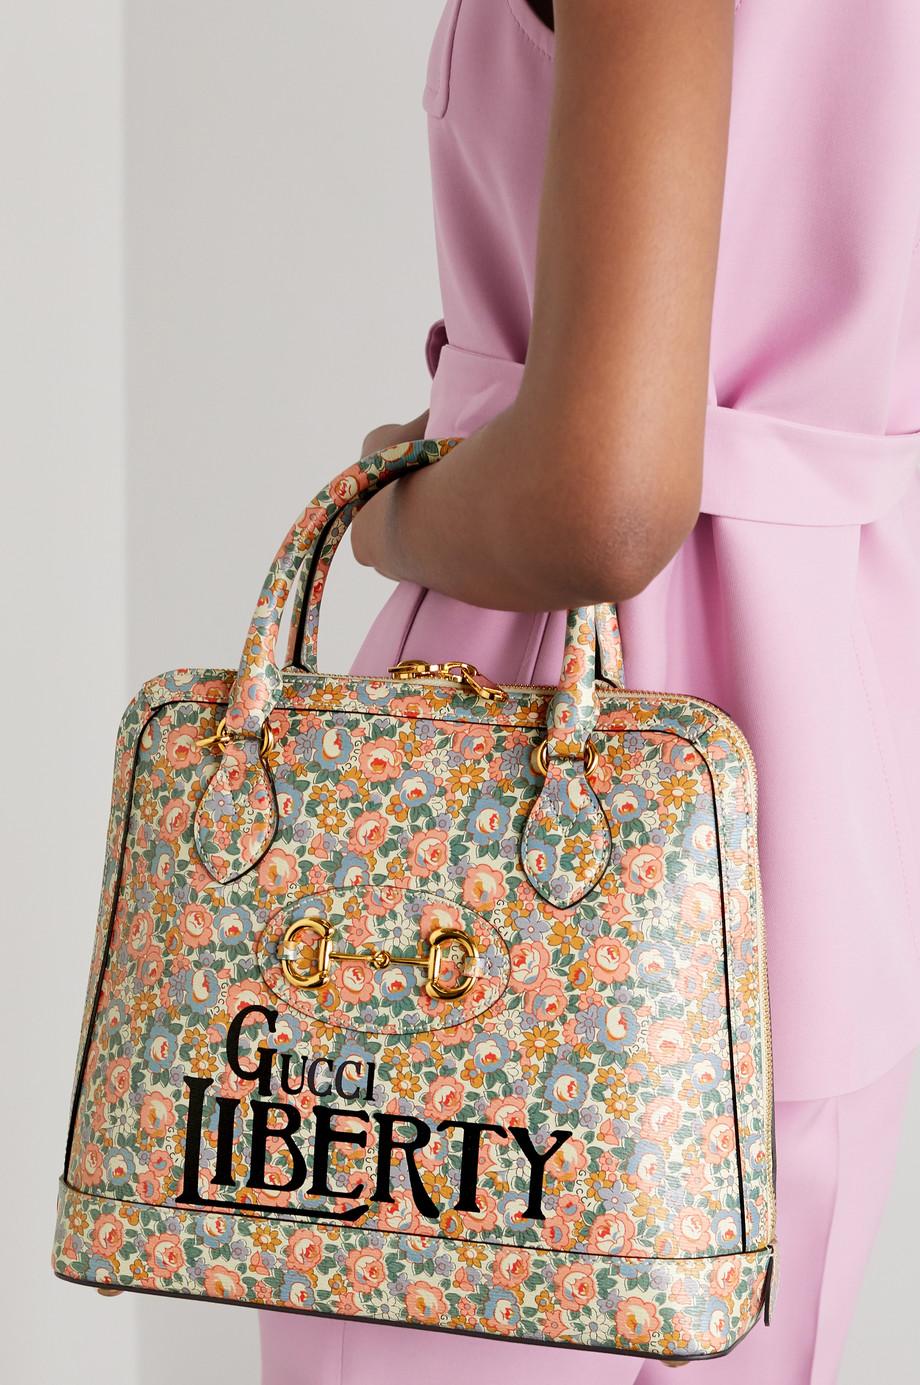 Gucci + Liberty 1955 Tote aus Leder mit Blumenprint und Horsebit-Detail